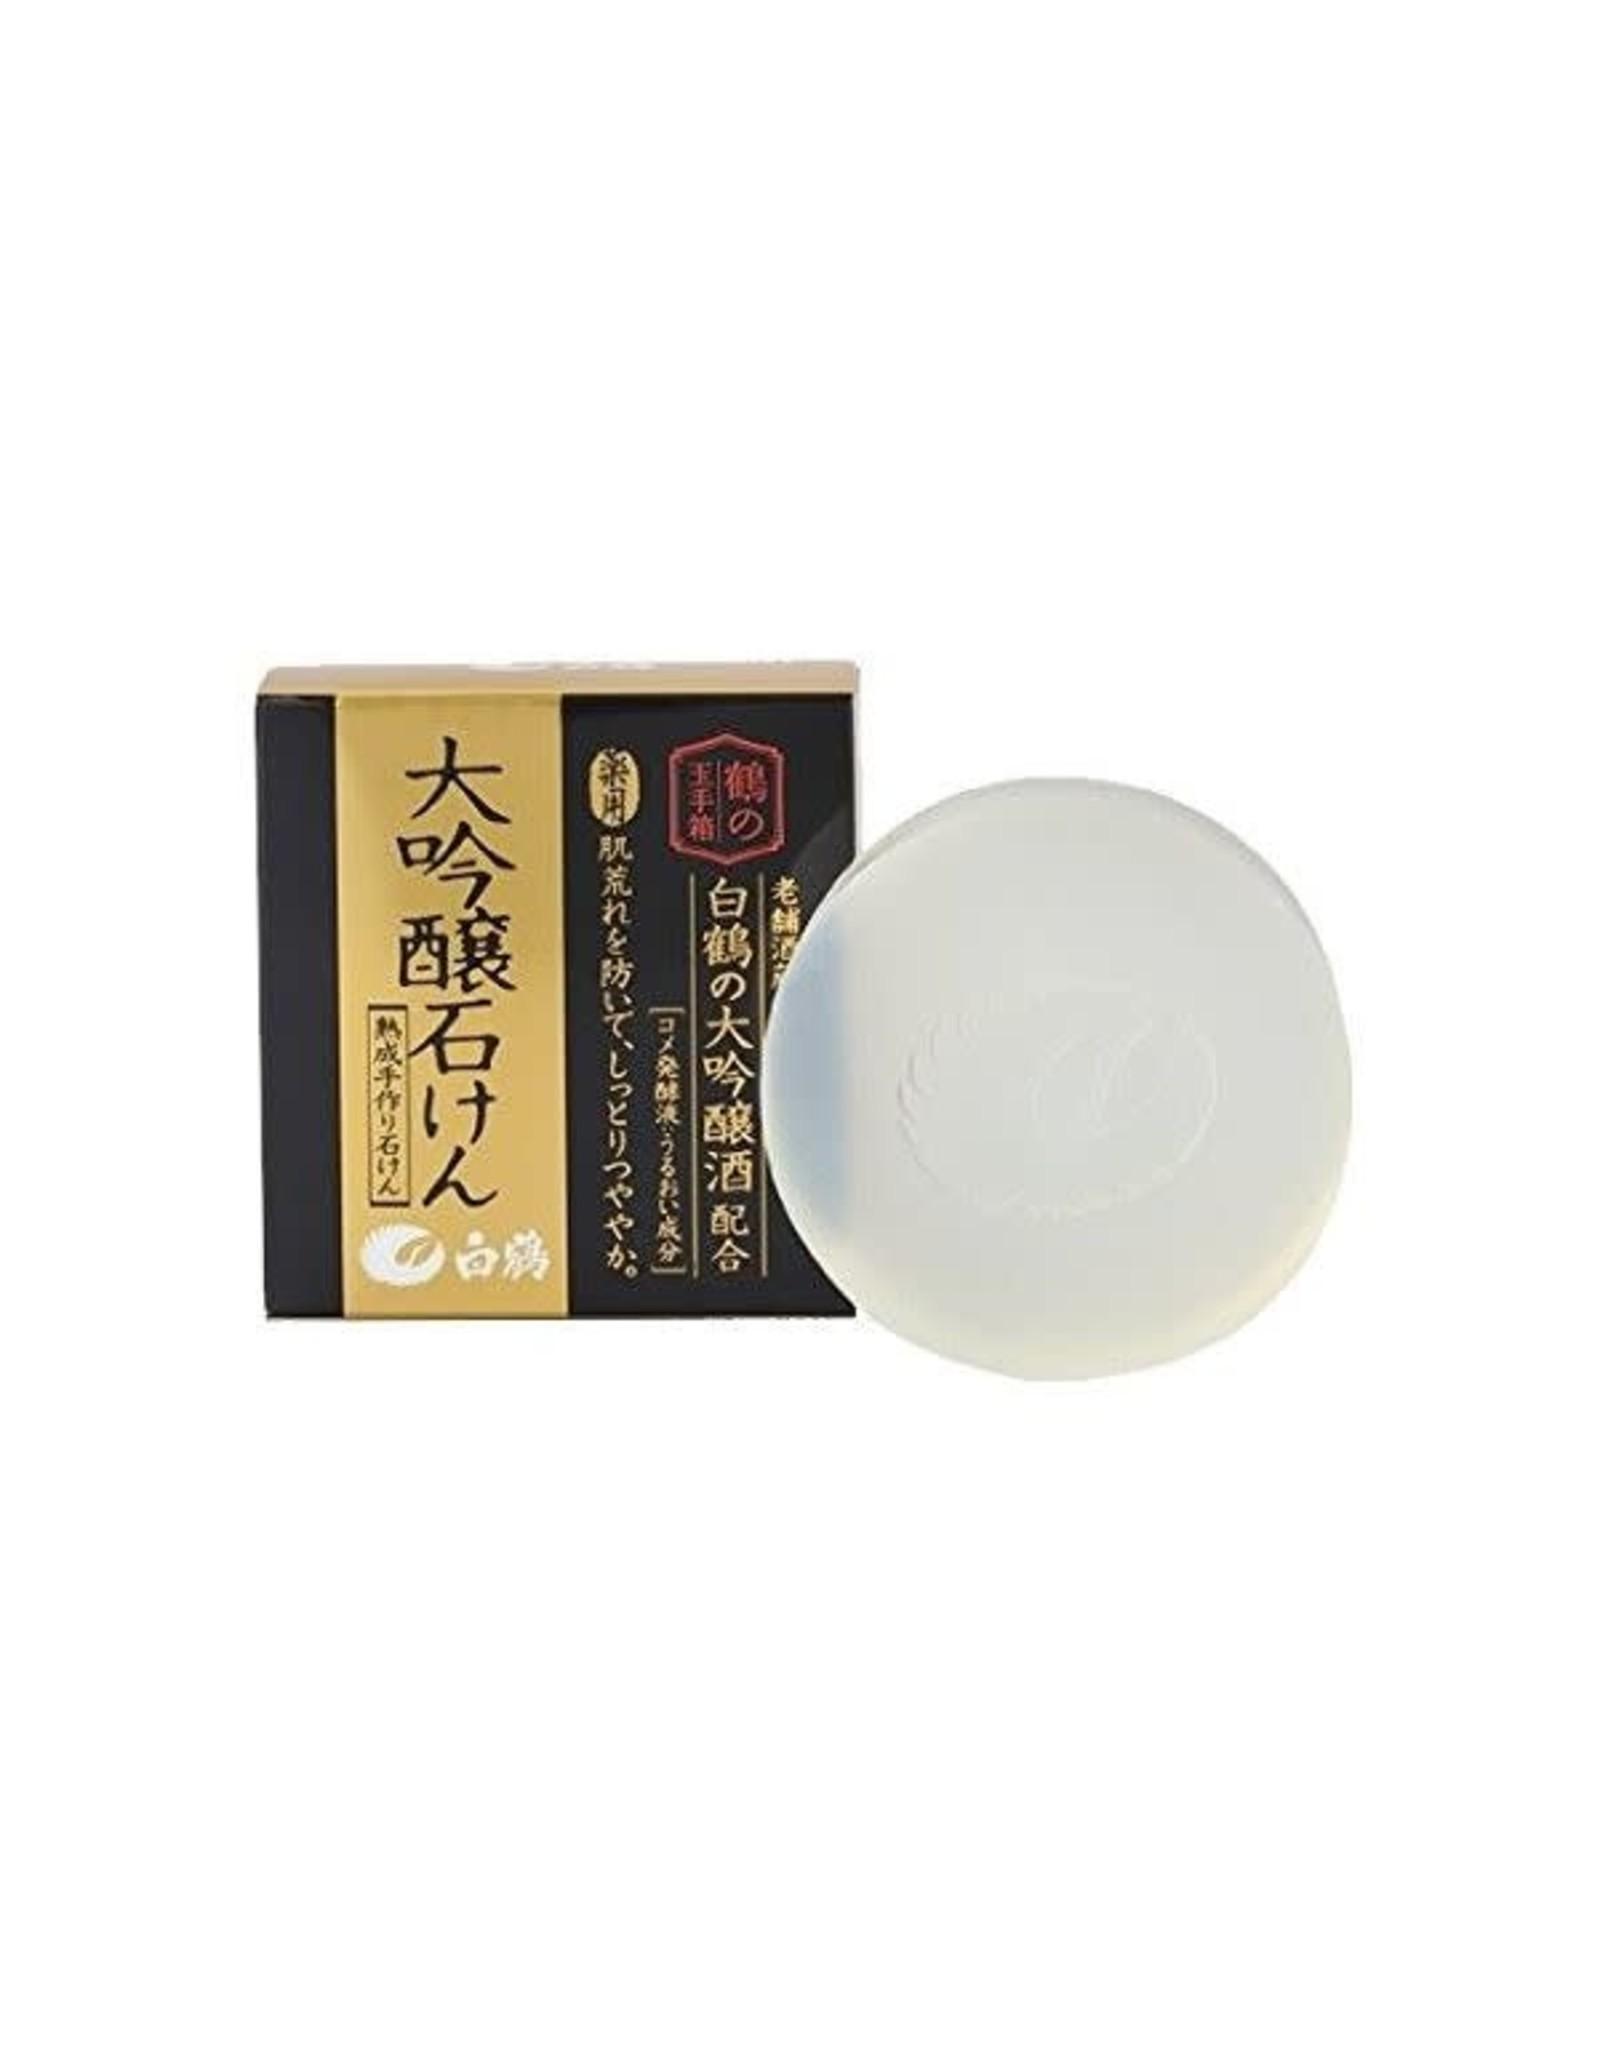 Hakutsuru Tamatebako Daiginjo Bar Soap